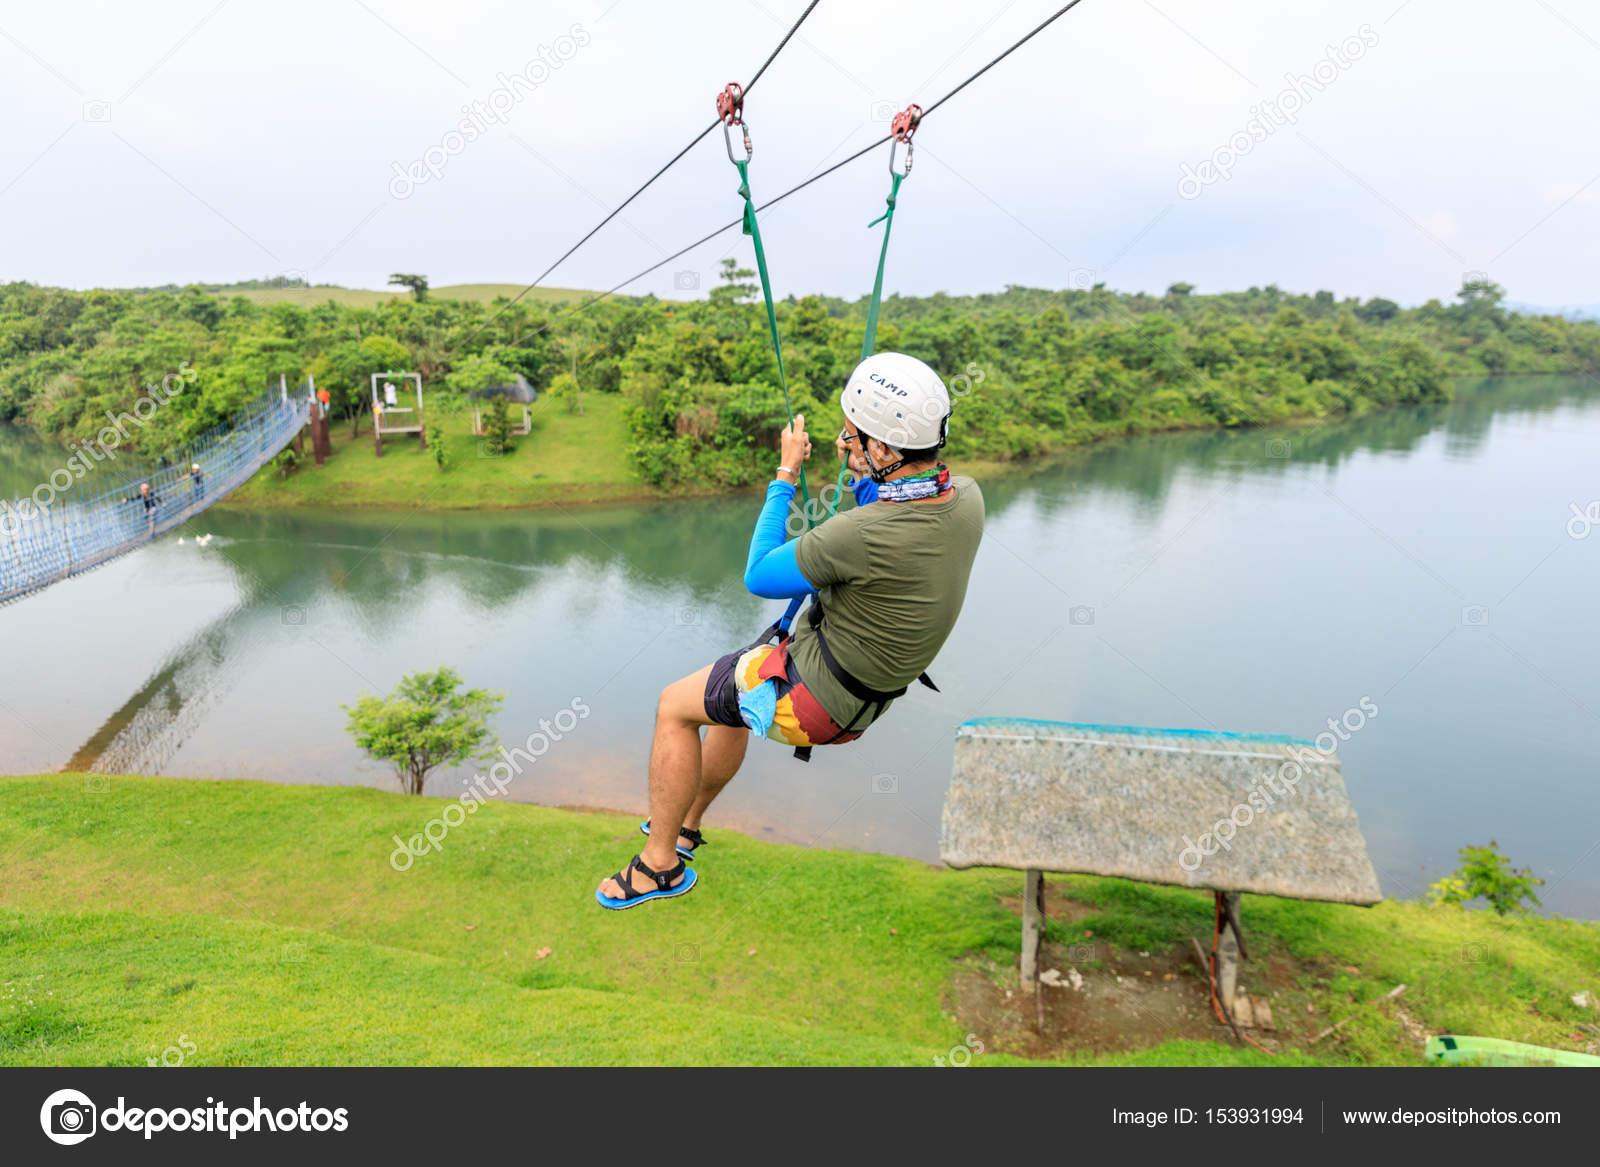 apr 23, 2017 adult man, zip line adventure at mountain lake resort